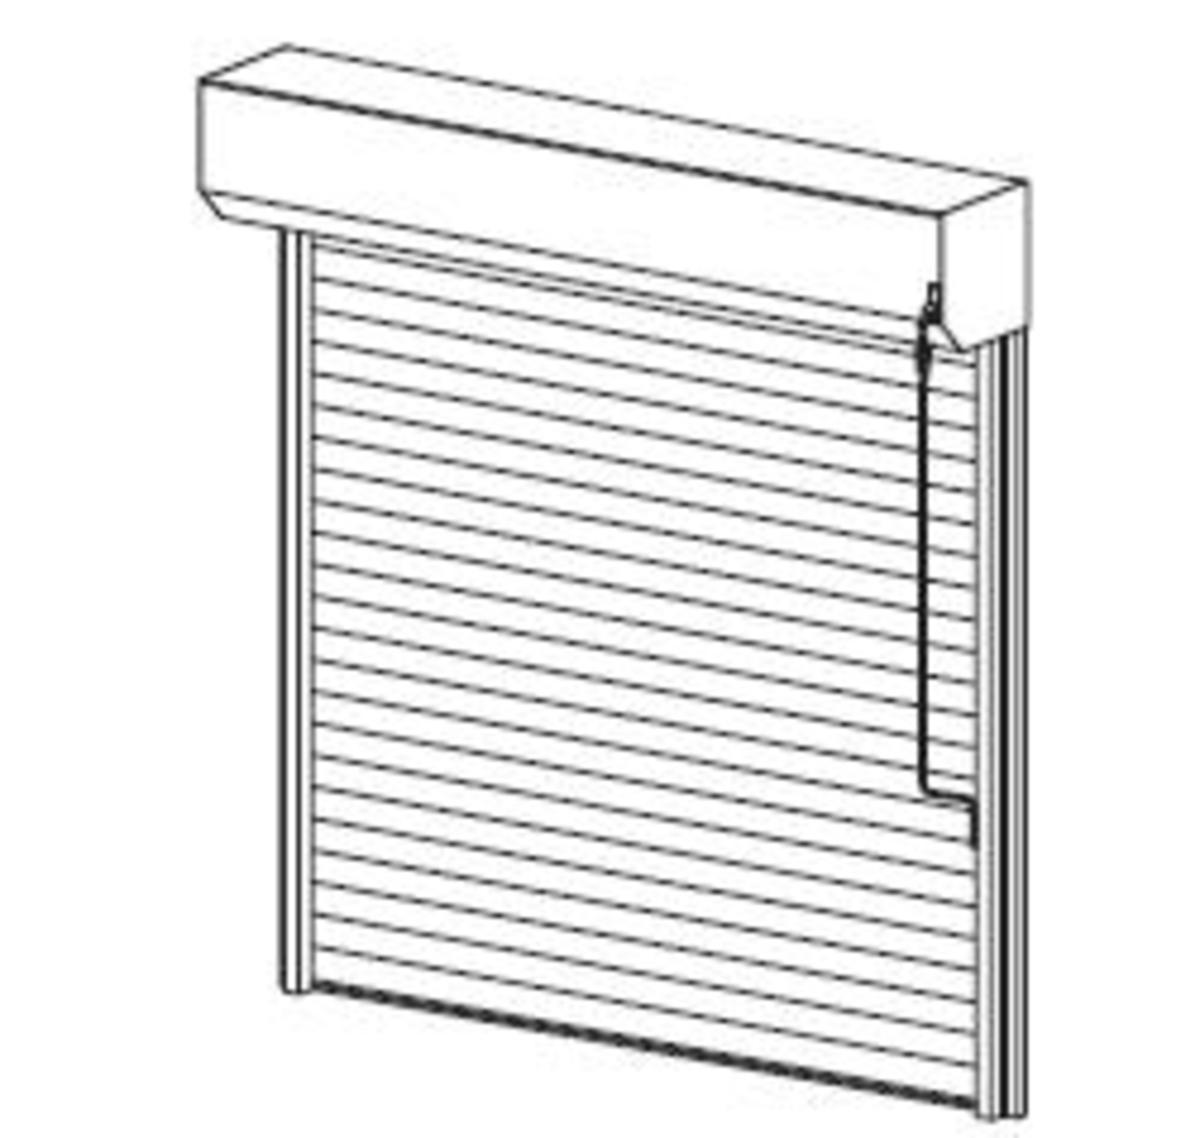 Fen tre facile porte de garage enroulable lames en acier for Fabricant porte de garage enroulable